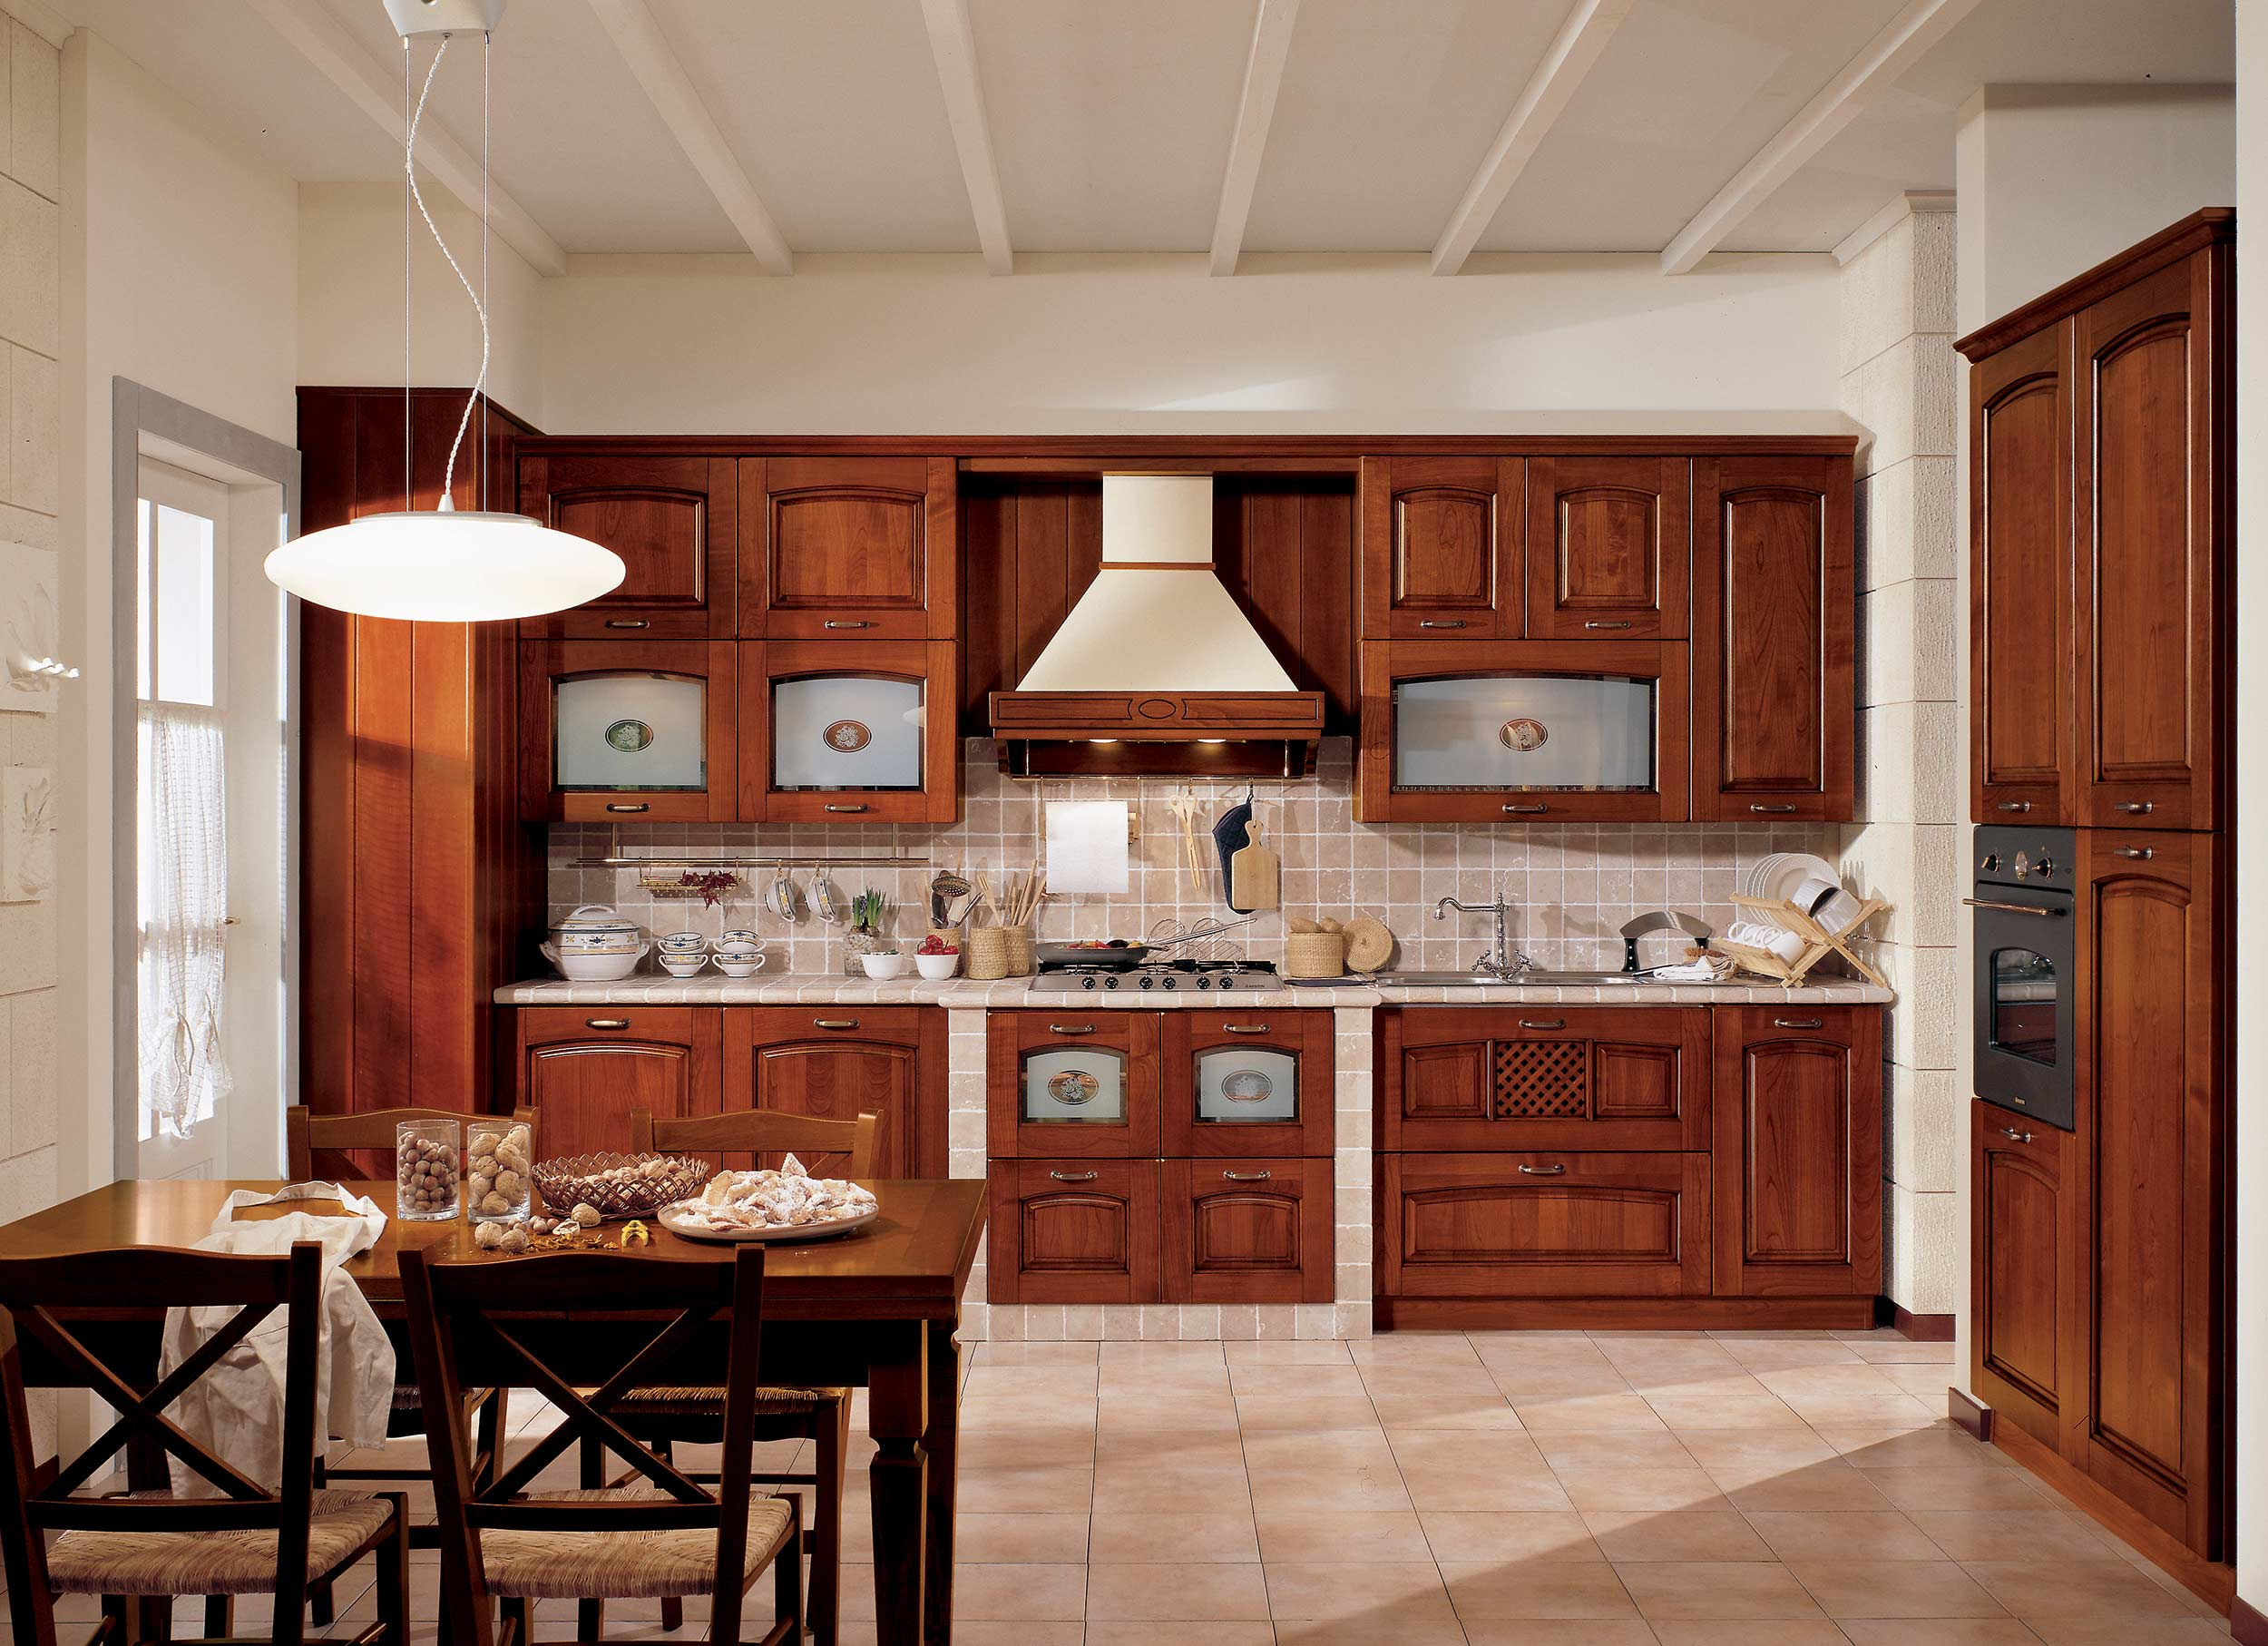 Cucina ginevra stosa cucine ravenna - Cucine in ciliegio moderne ...